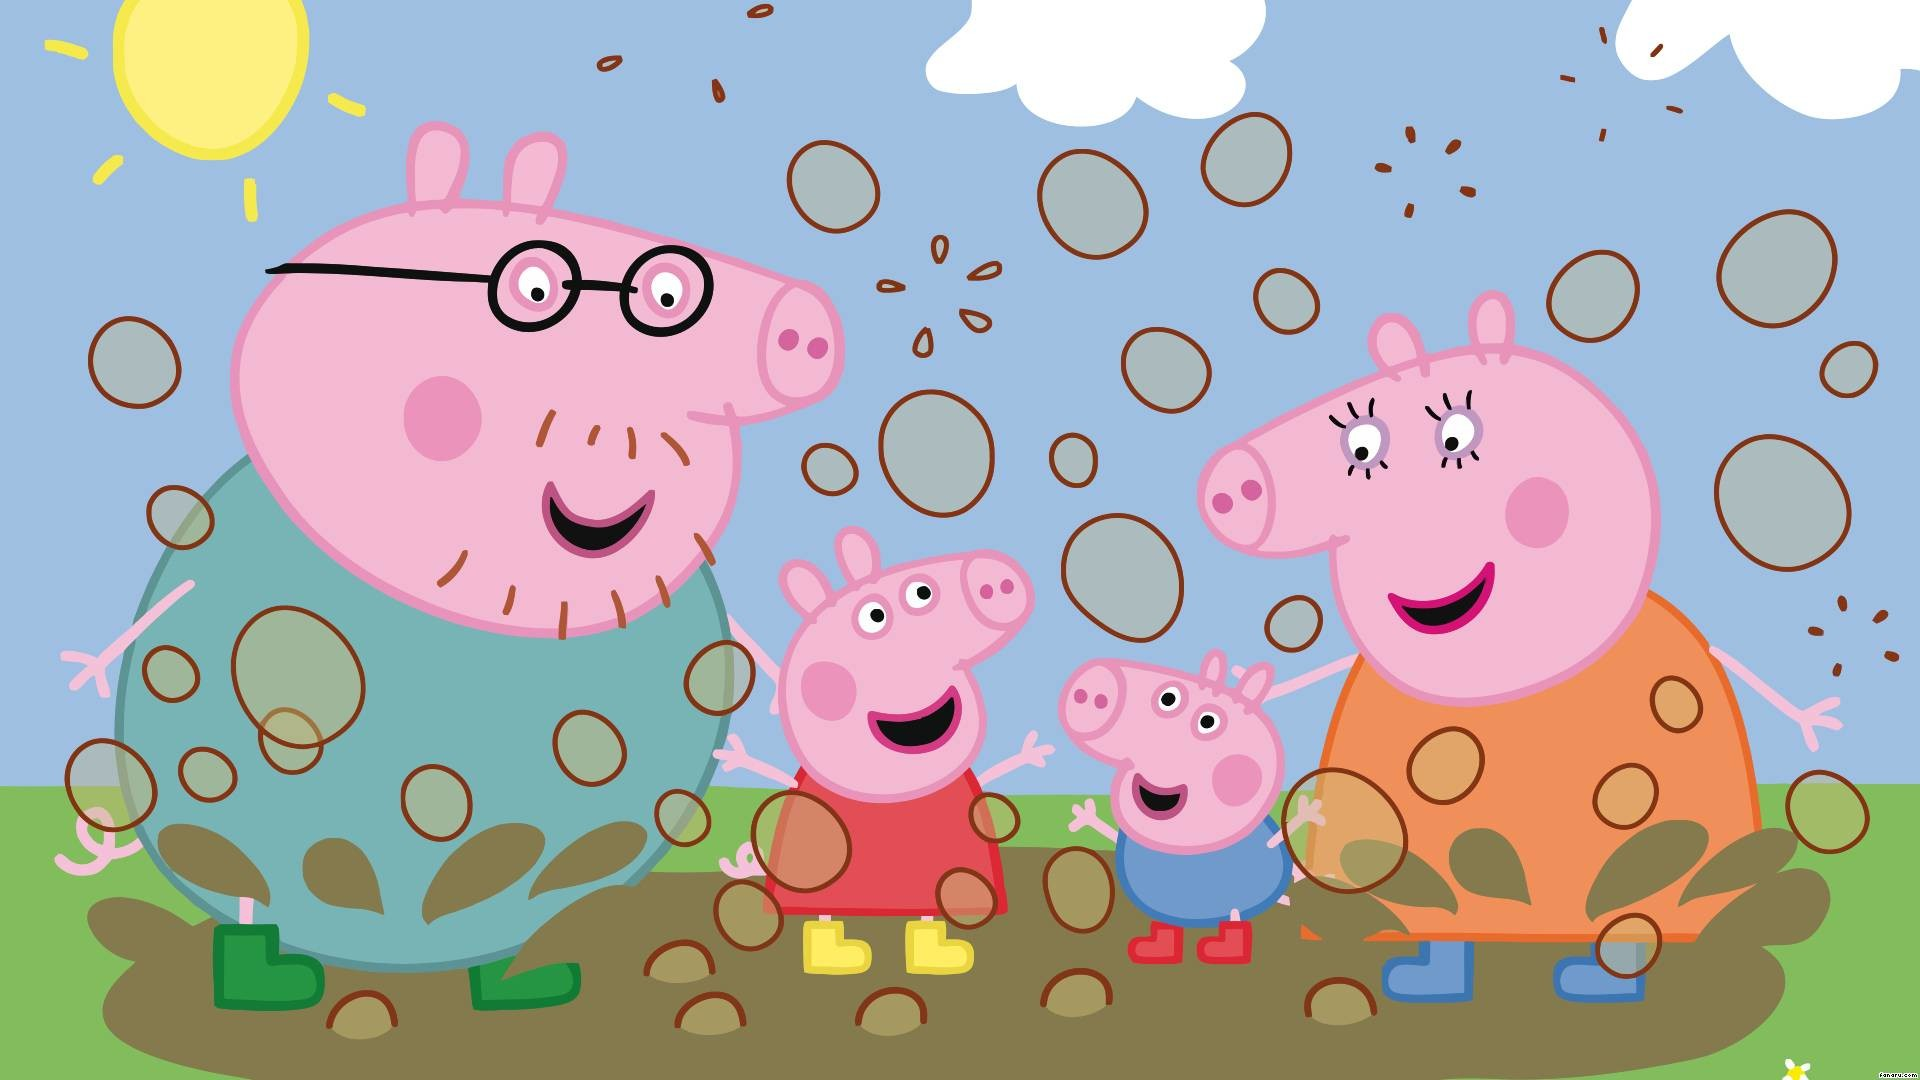 Peppa Pig Room Decor New Vgo Ltd Peppa Pig Wallpaper Mural Childrens  Bedroom Design Wm297 Xl